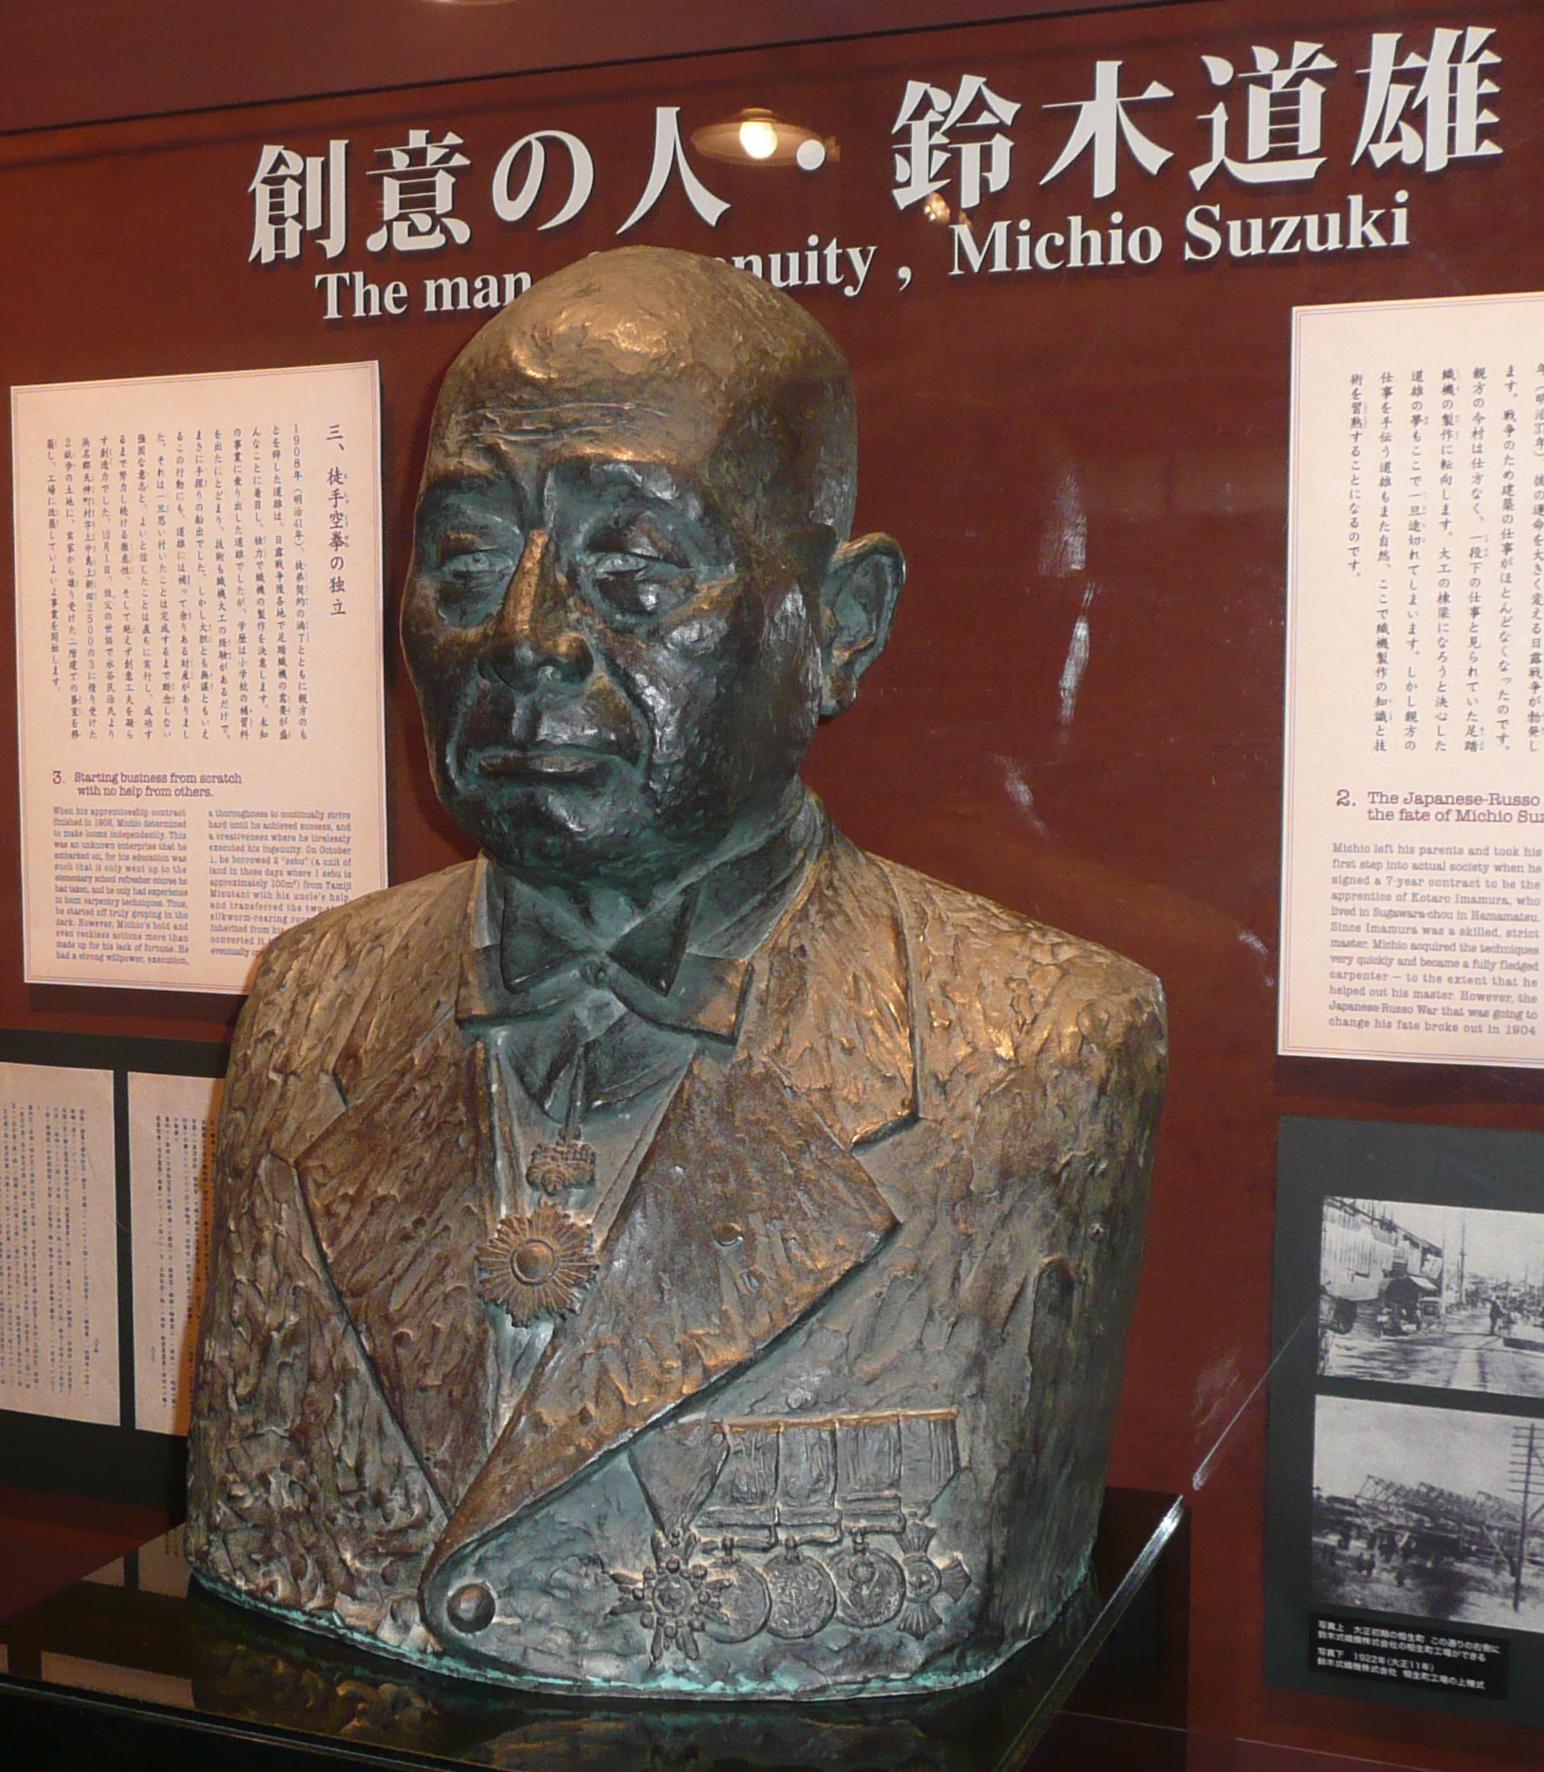 Michio Suzuki Inventor